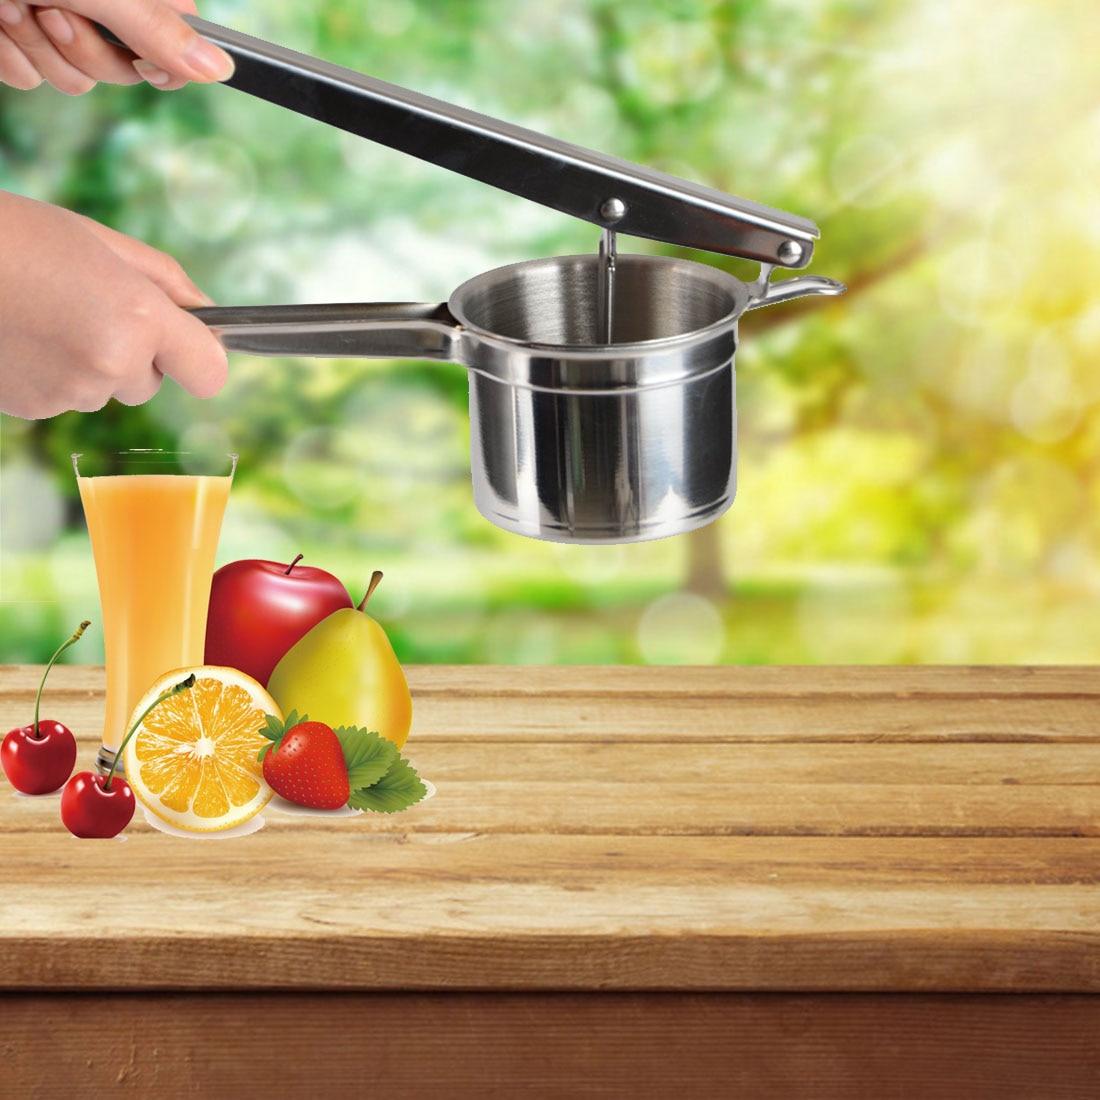 1Pc Steel Stainless Kitchen Useful Gadget Fruit Lemon Lime Orange Squeezer Juicer Manual Hand Press Tool